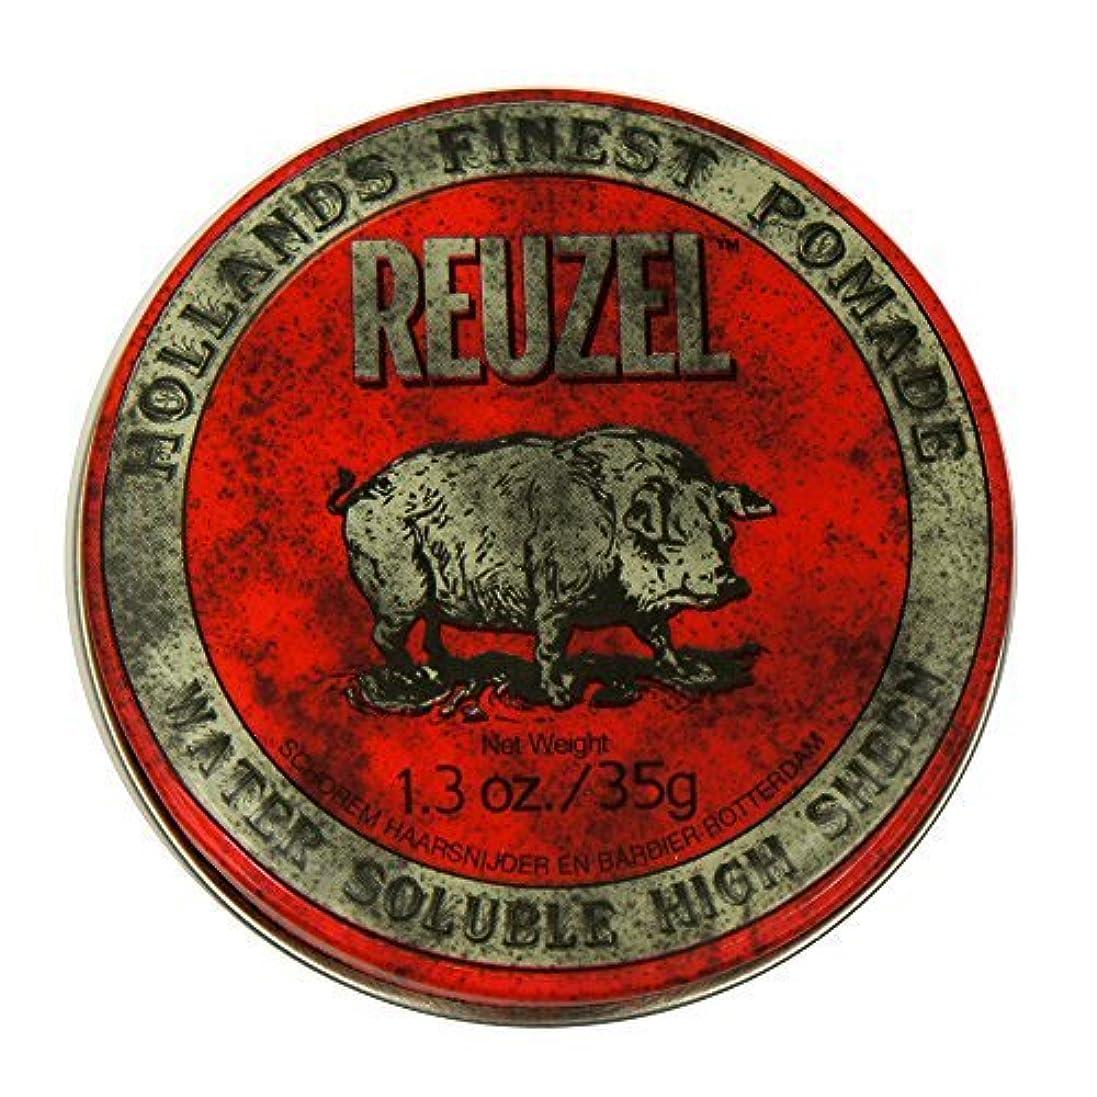 値下げ社会場合Reuzel Red Hair Pomade Piglet 1.3oz [並行輸入品]